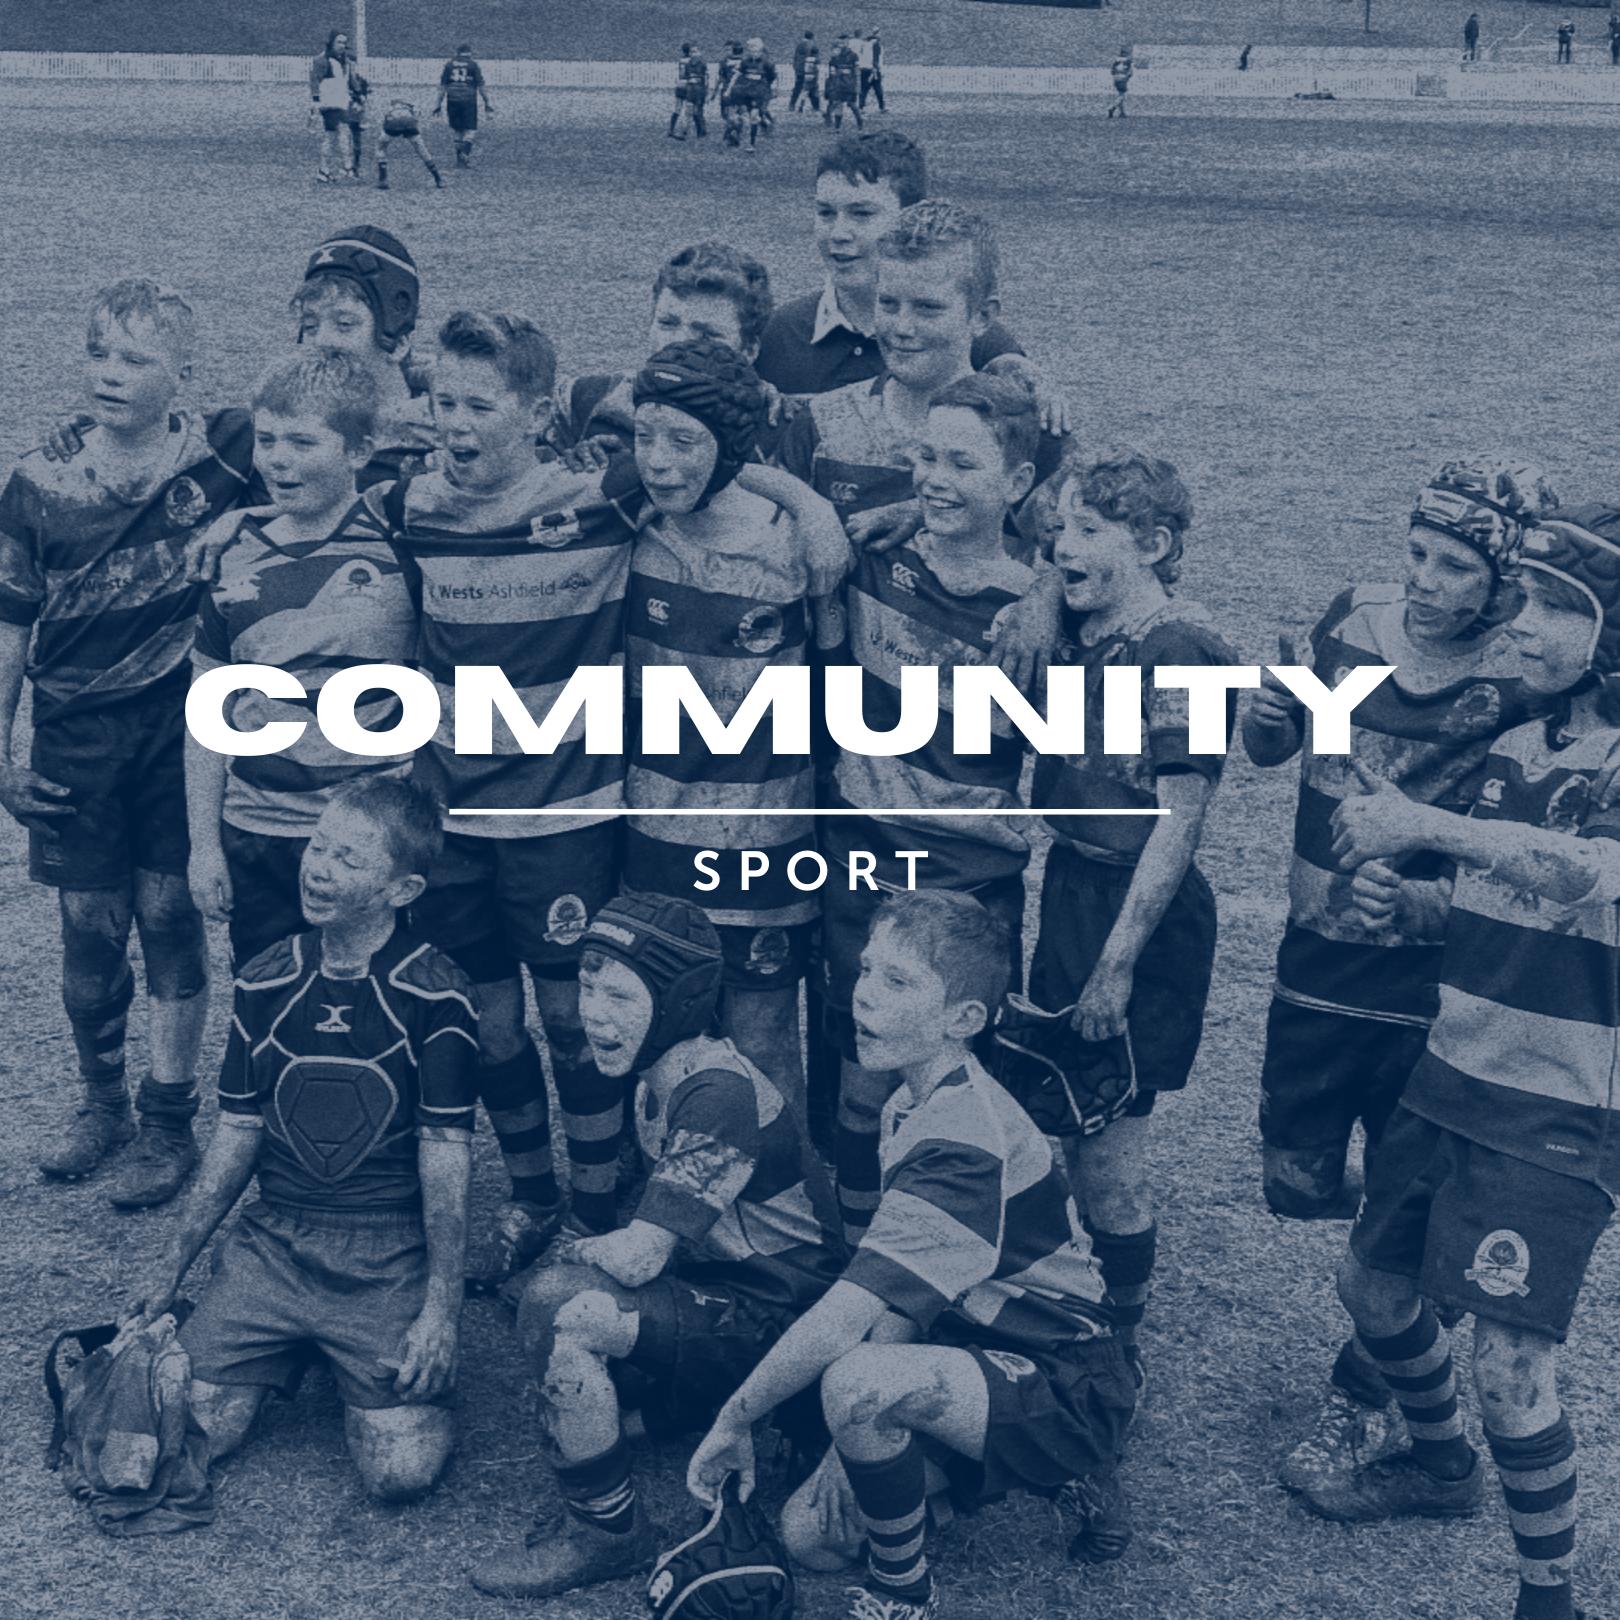 Community sport mockup